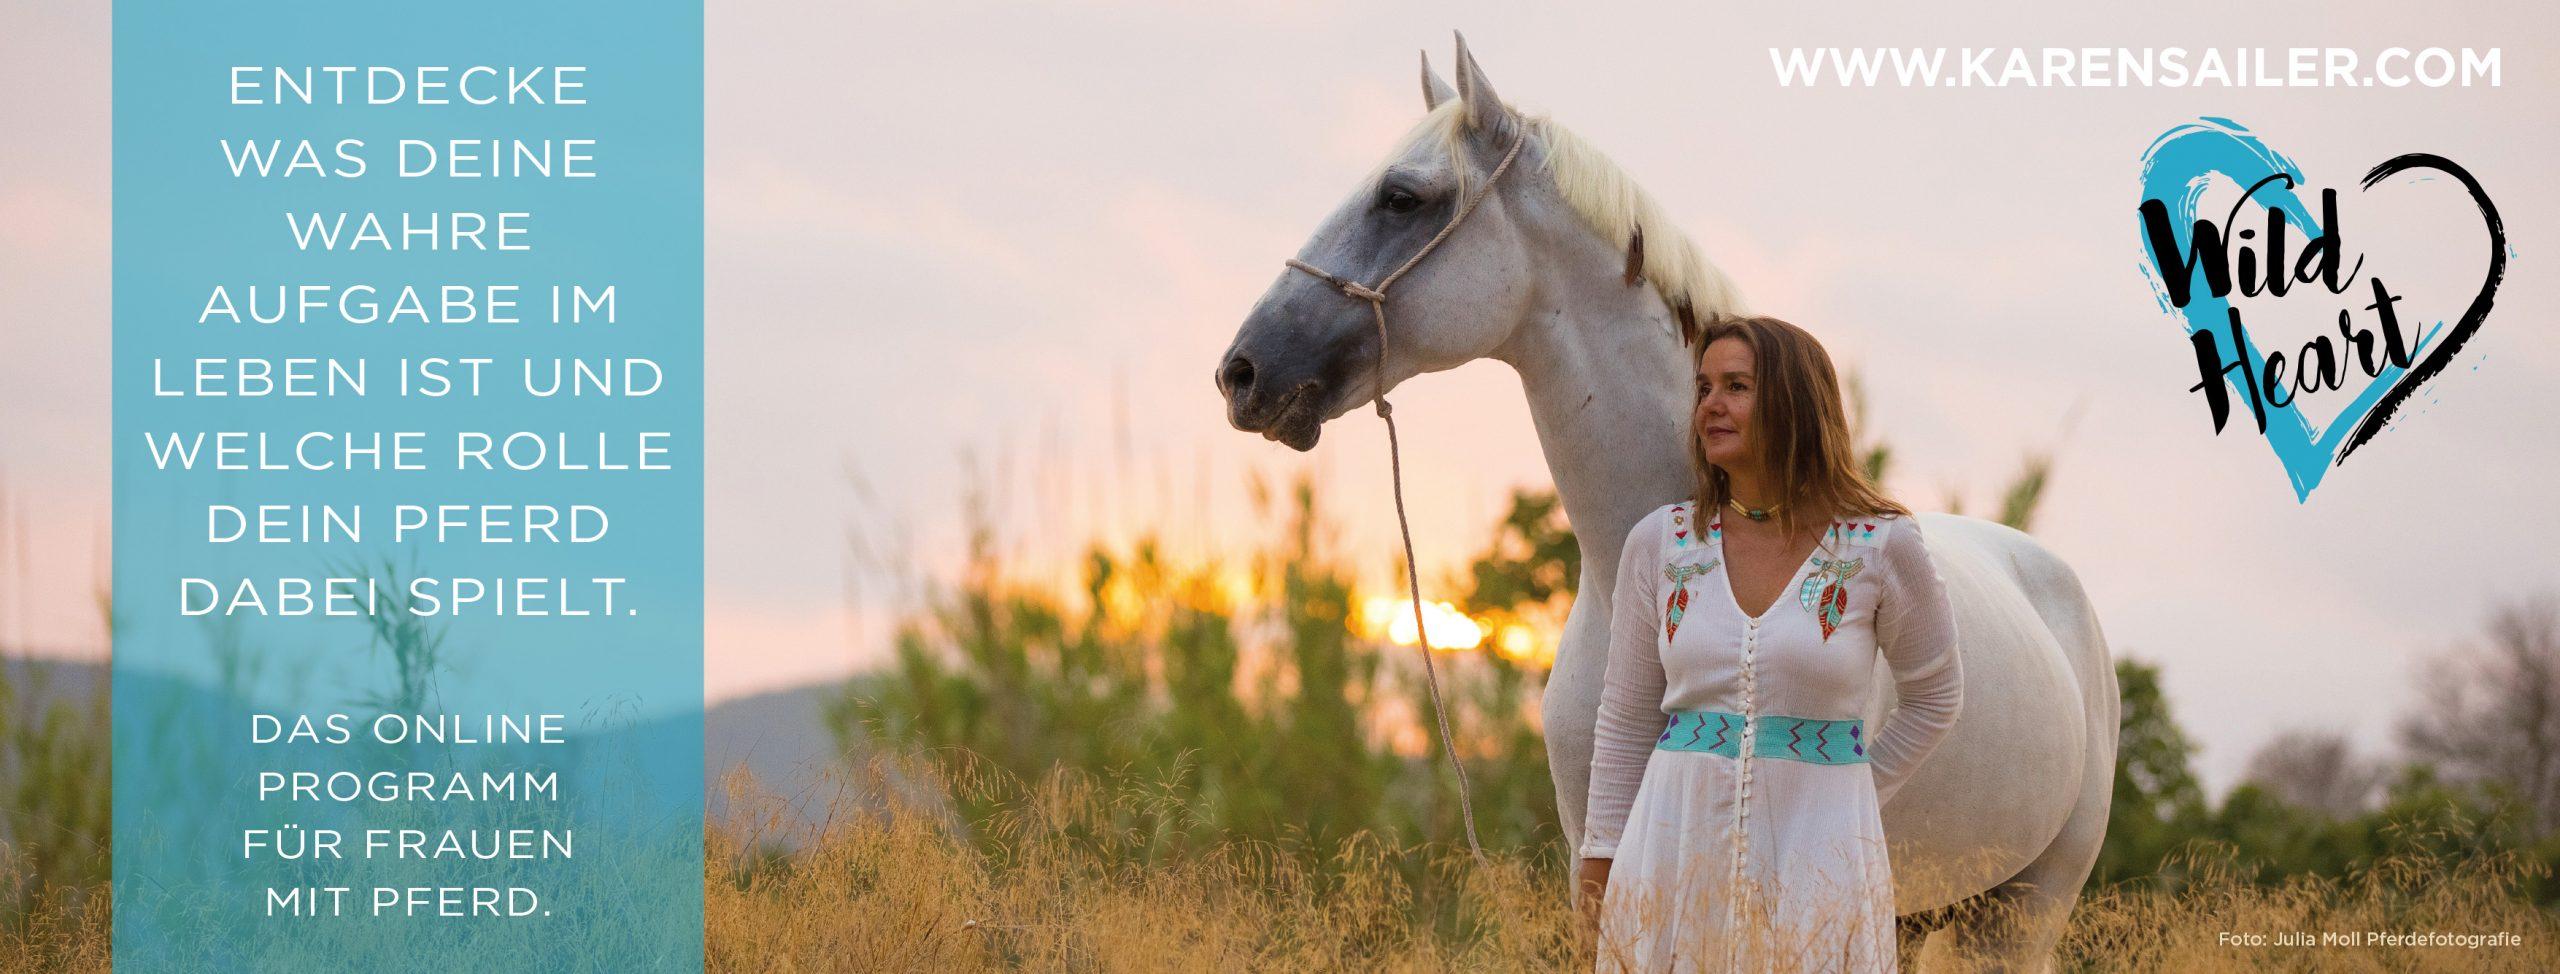 Wild Heart Karen Sailer